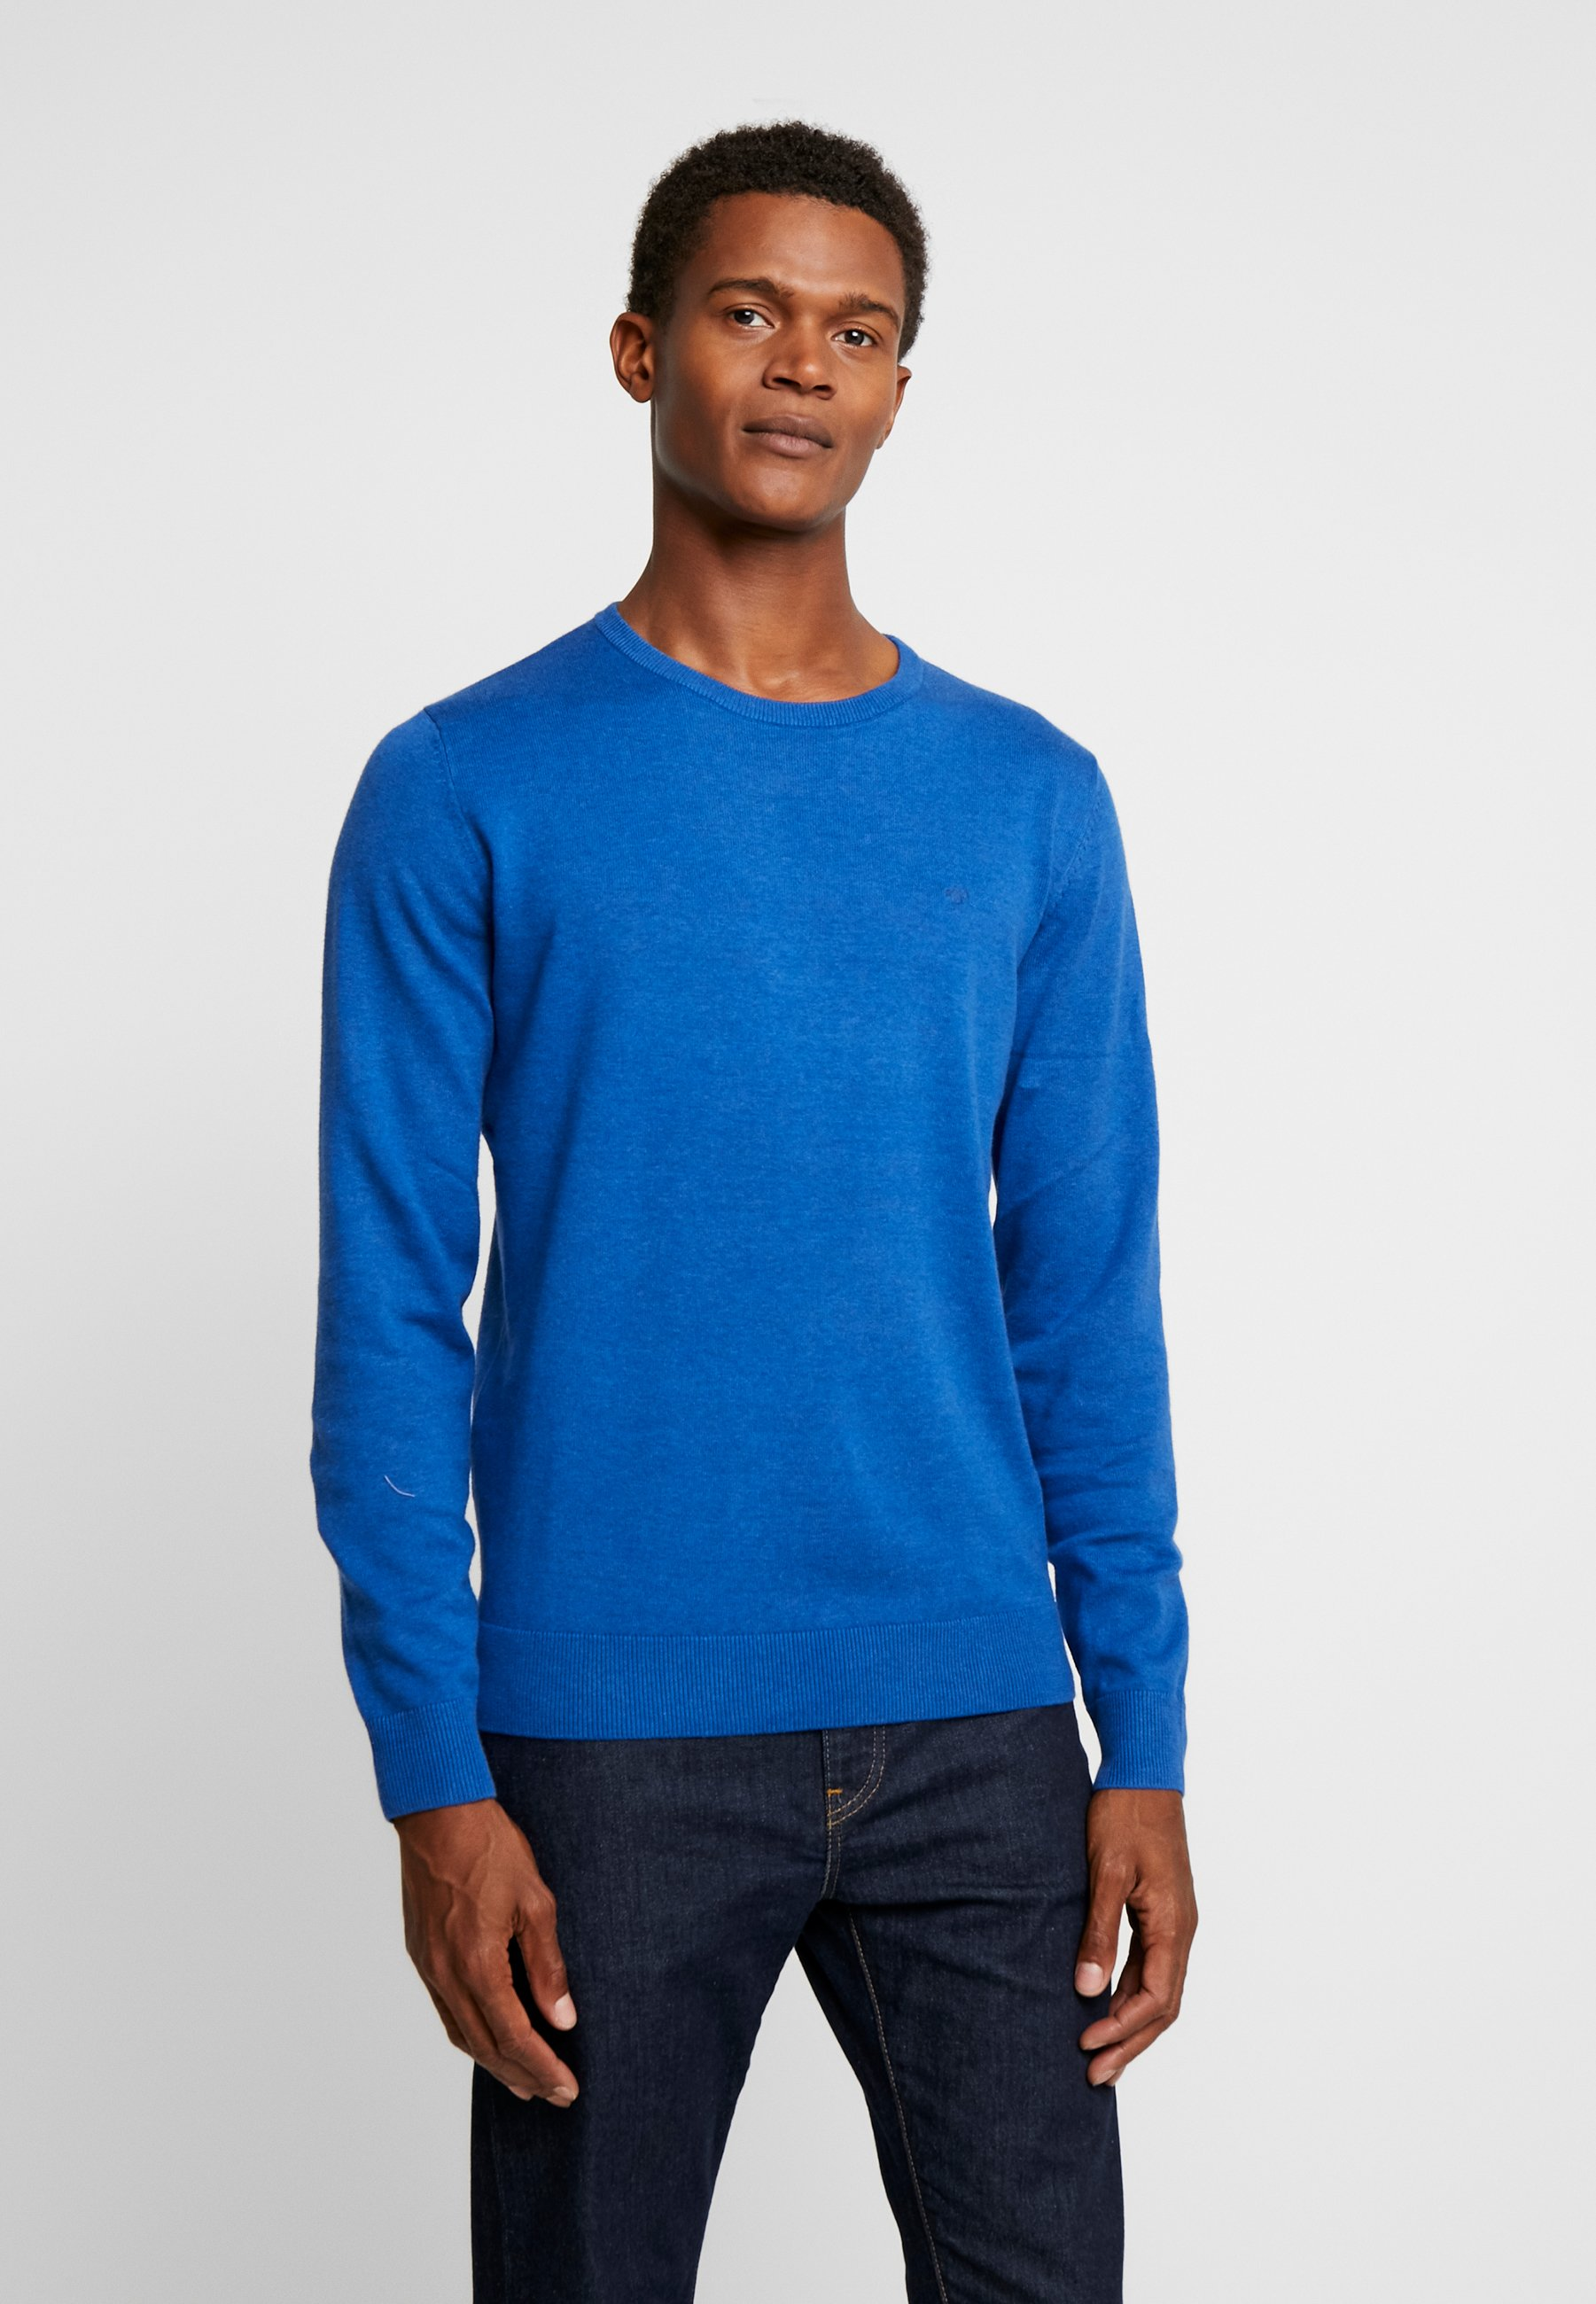 Tom NeckPullover Melange Crew Tailor Blue Basic Active Dark y7gmY6Ibfv